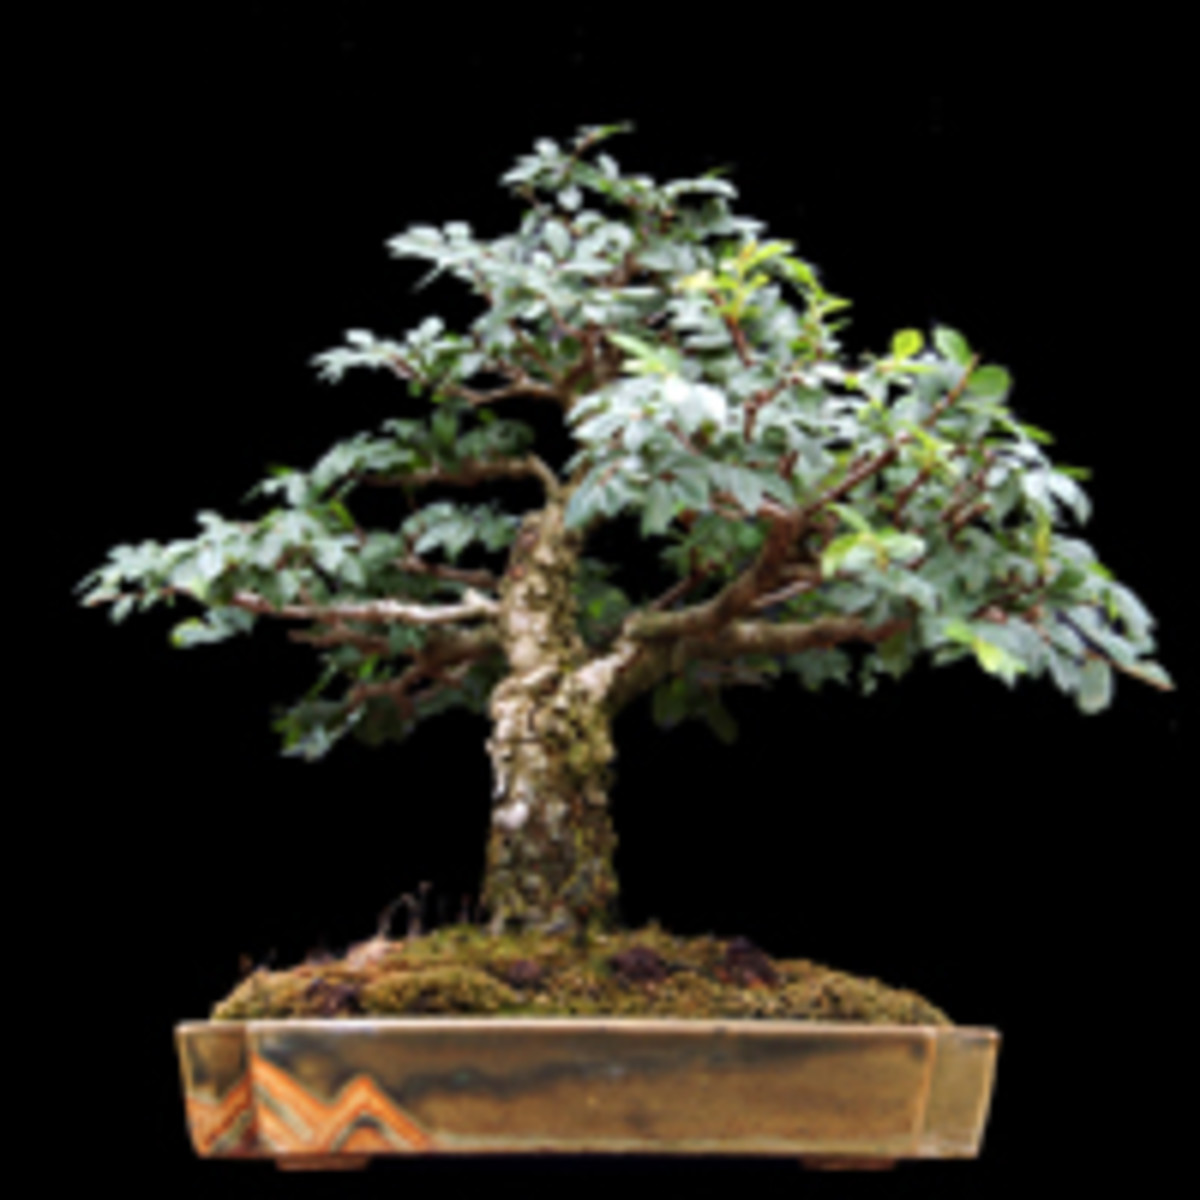 In bonsai form